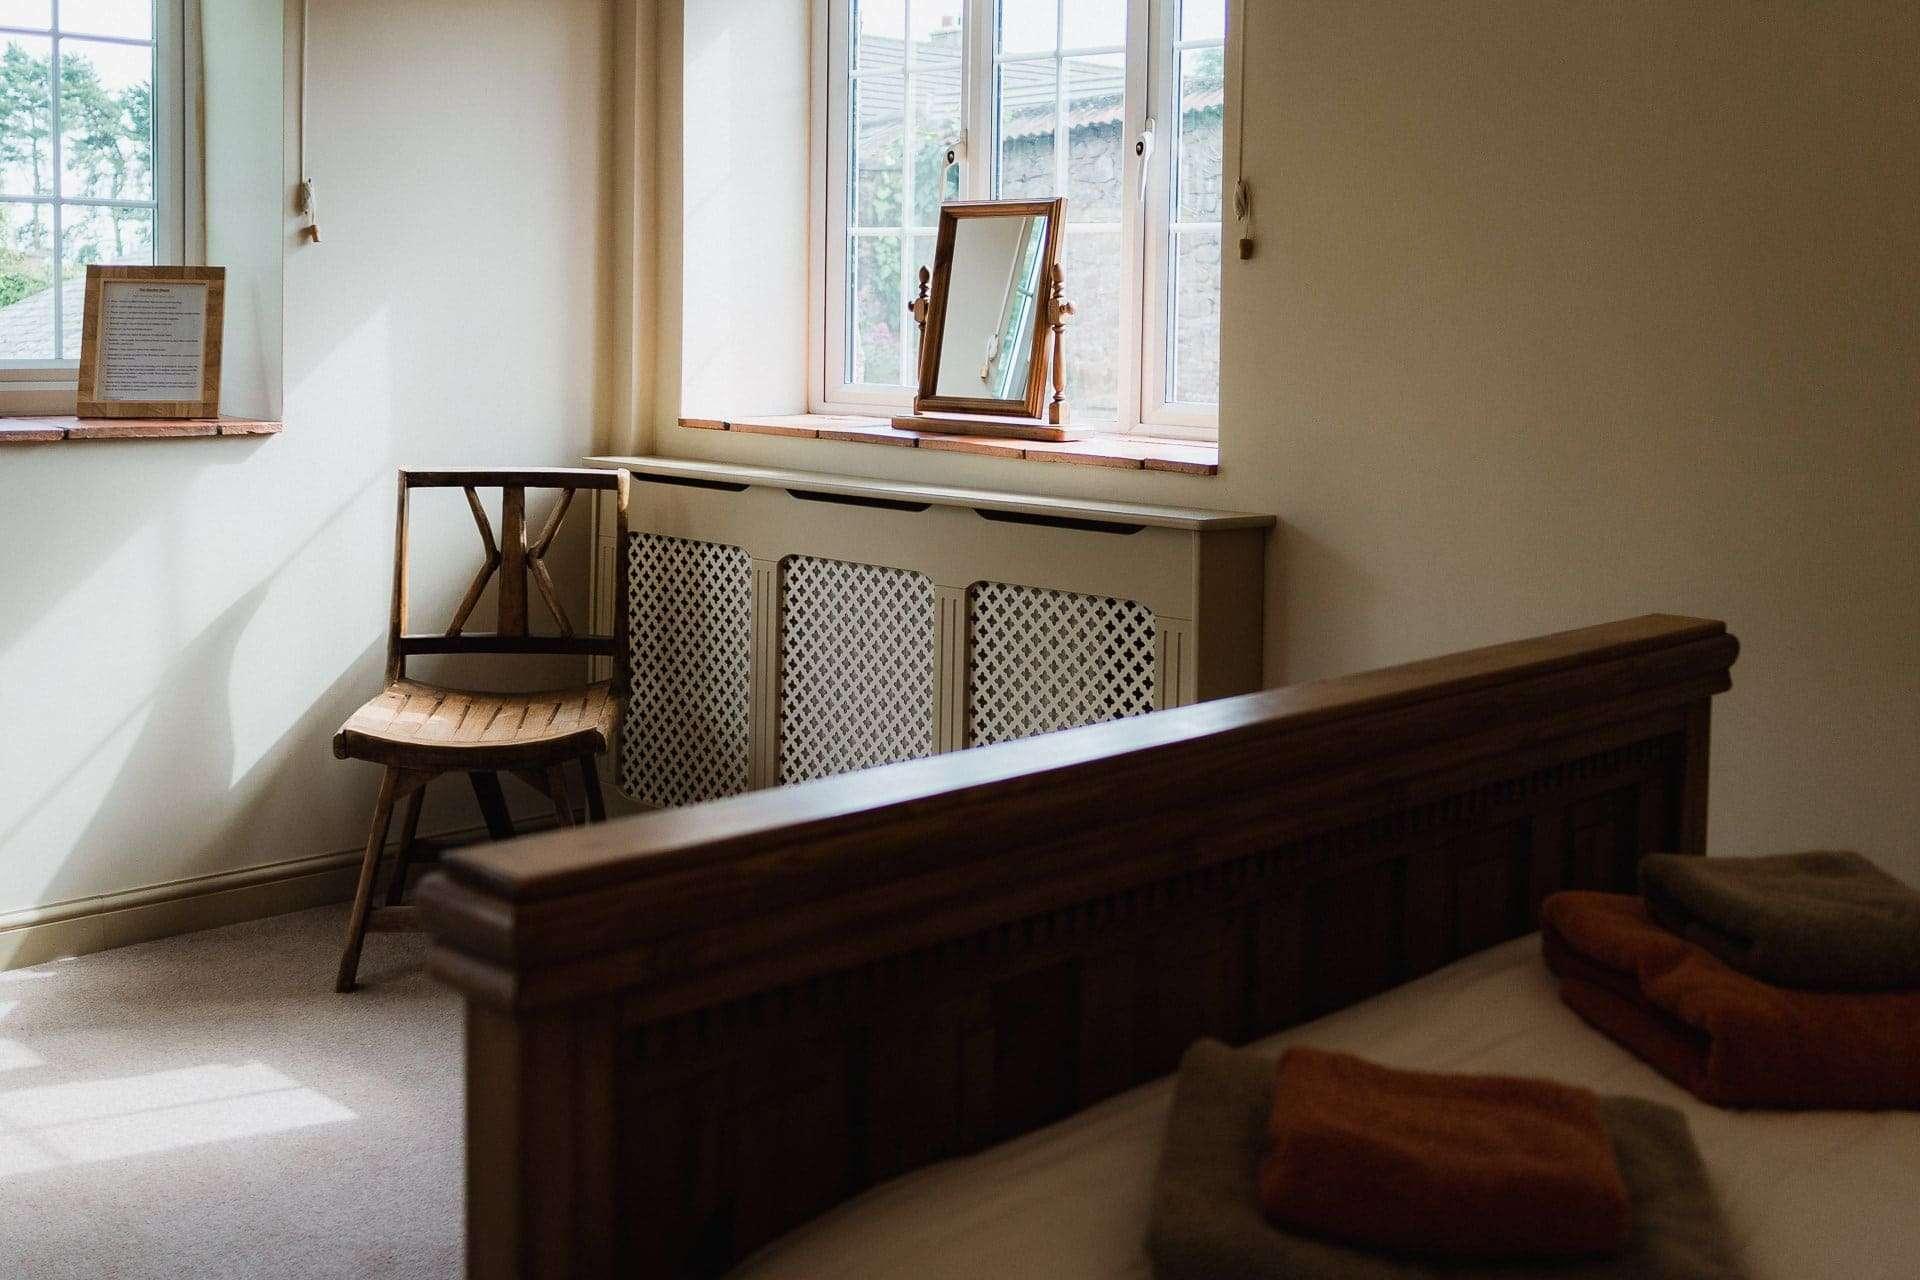 THE GARDEN ROOM Stoodleigh Court Coach House